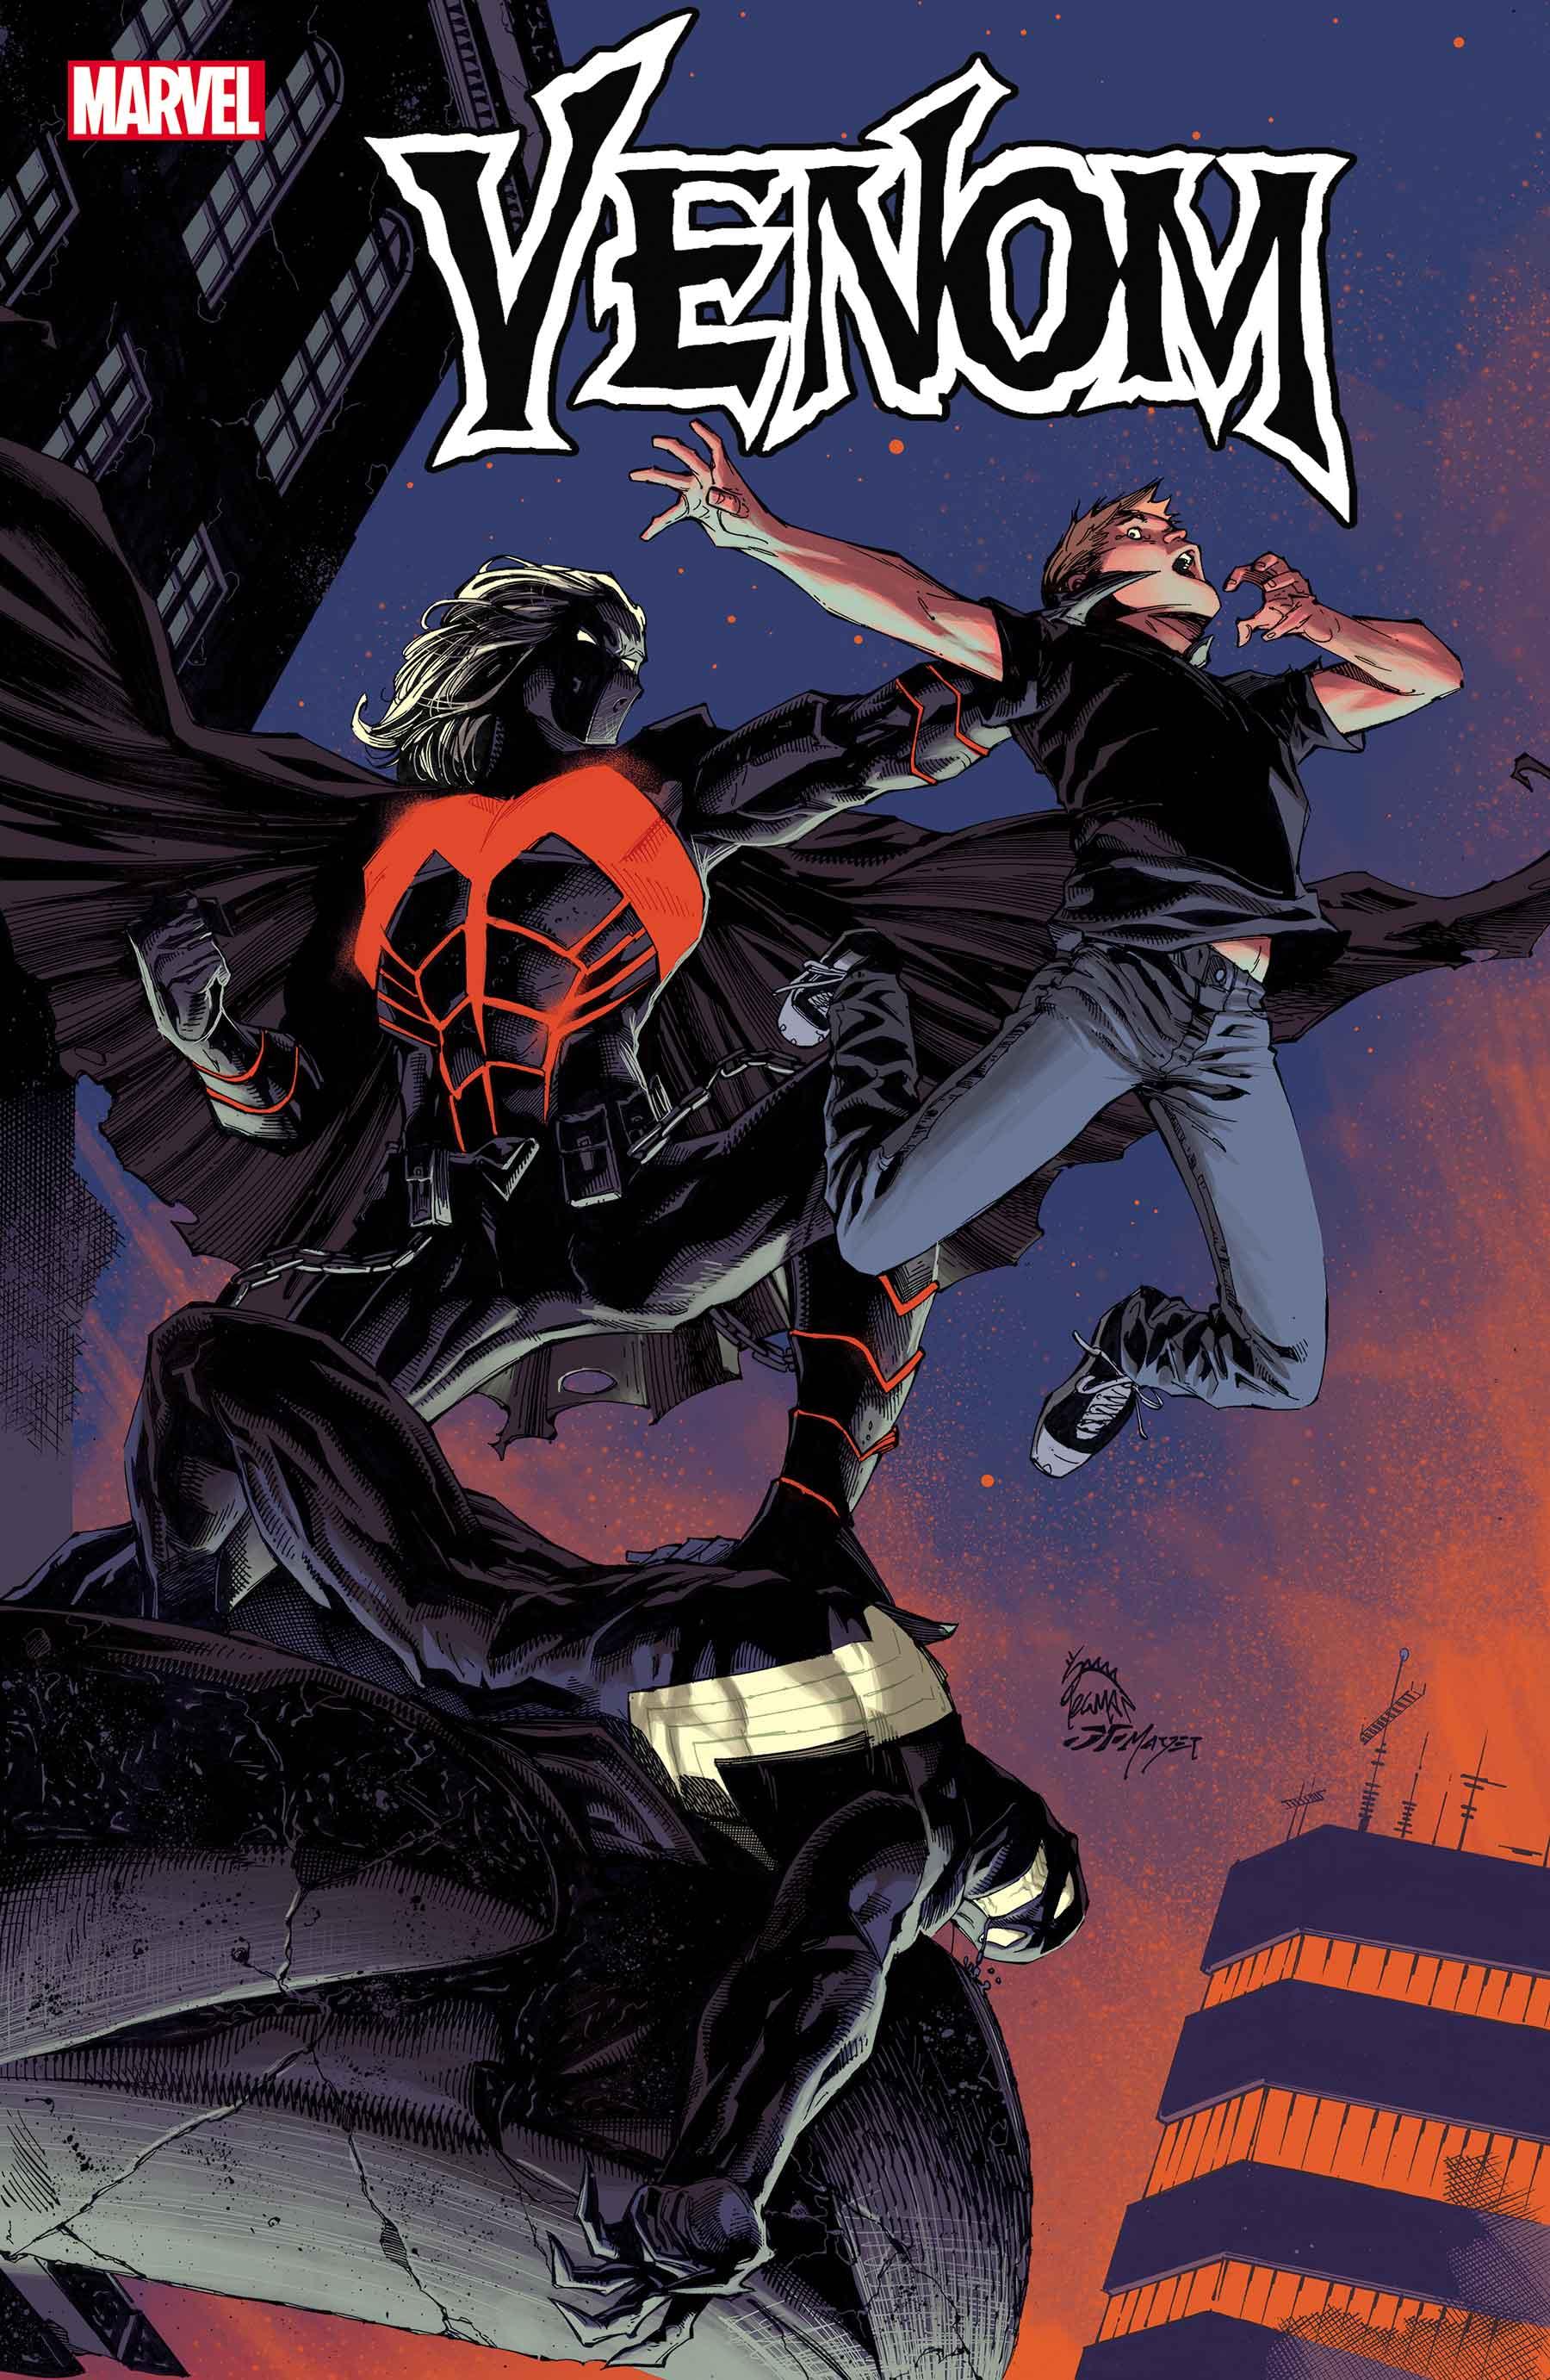 Venom (2018) #29